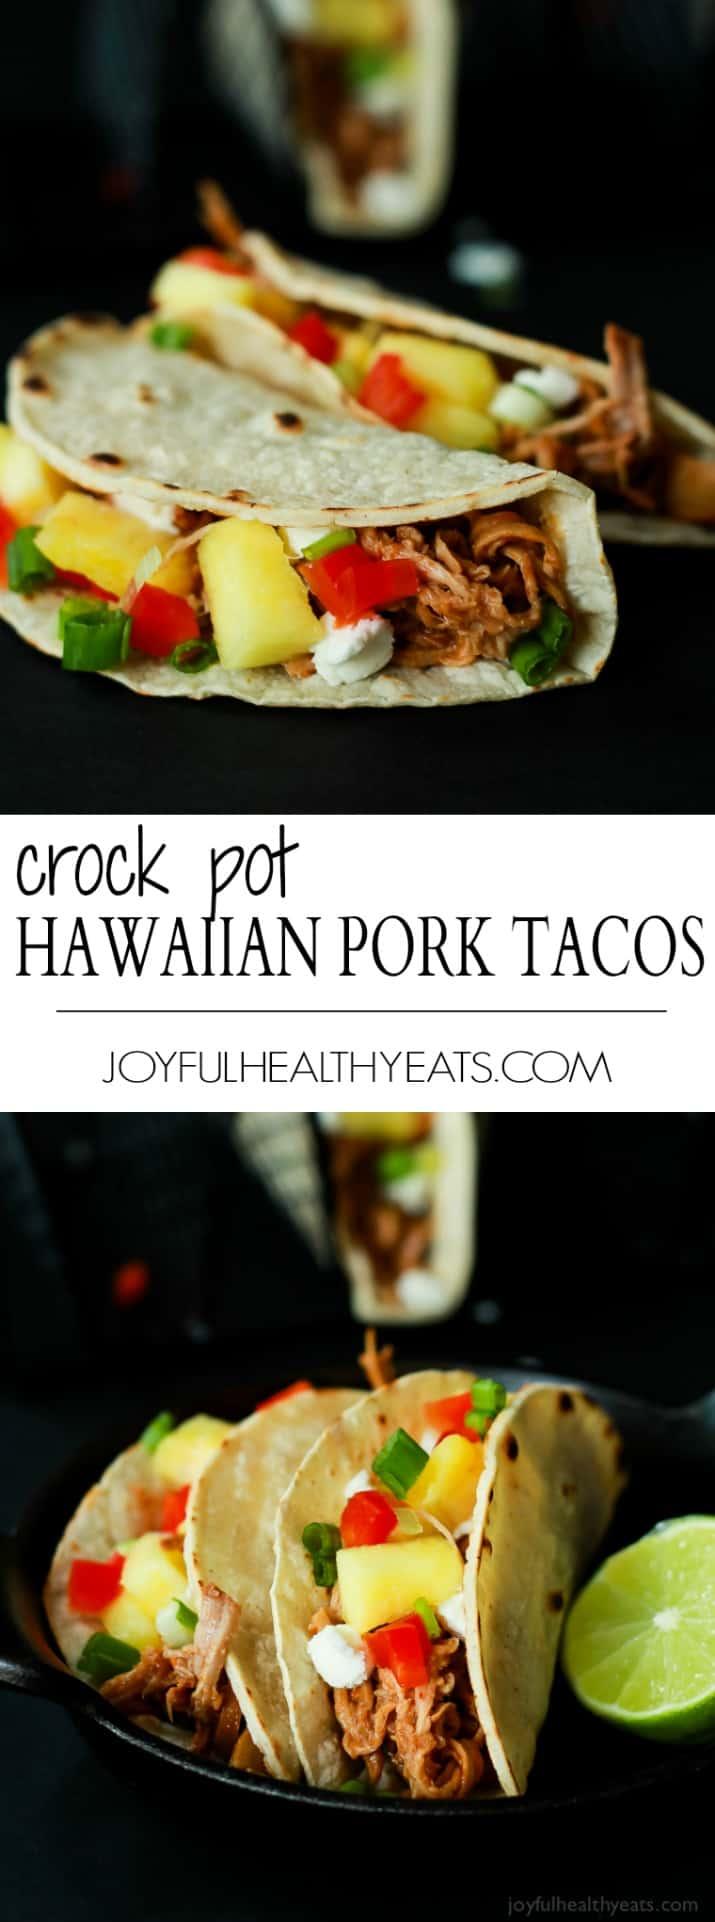 Pinterest collage for Crock Pot Hawaiian Pork Tacos recipe